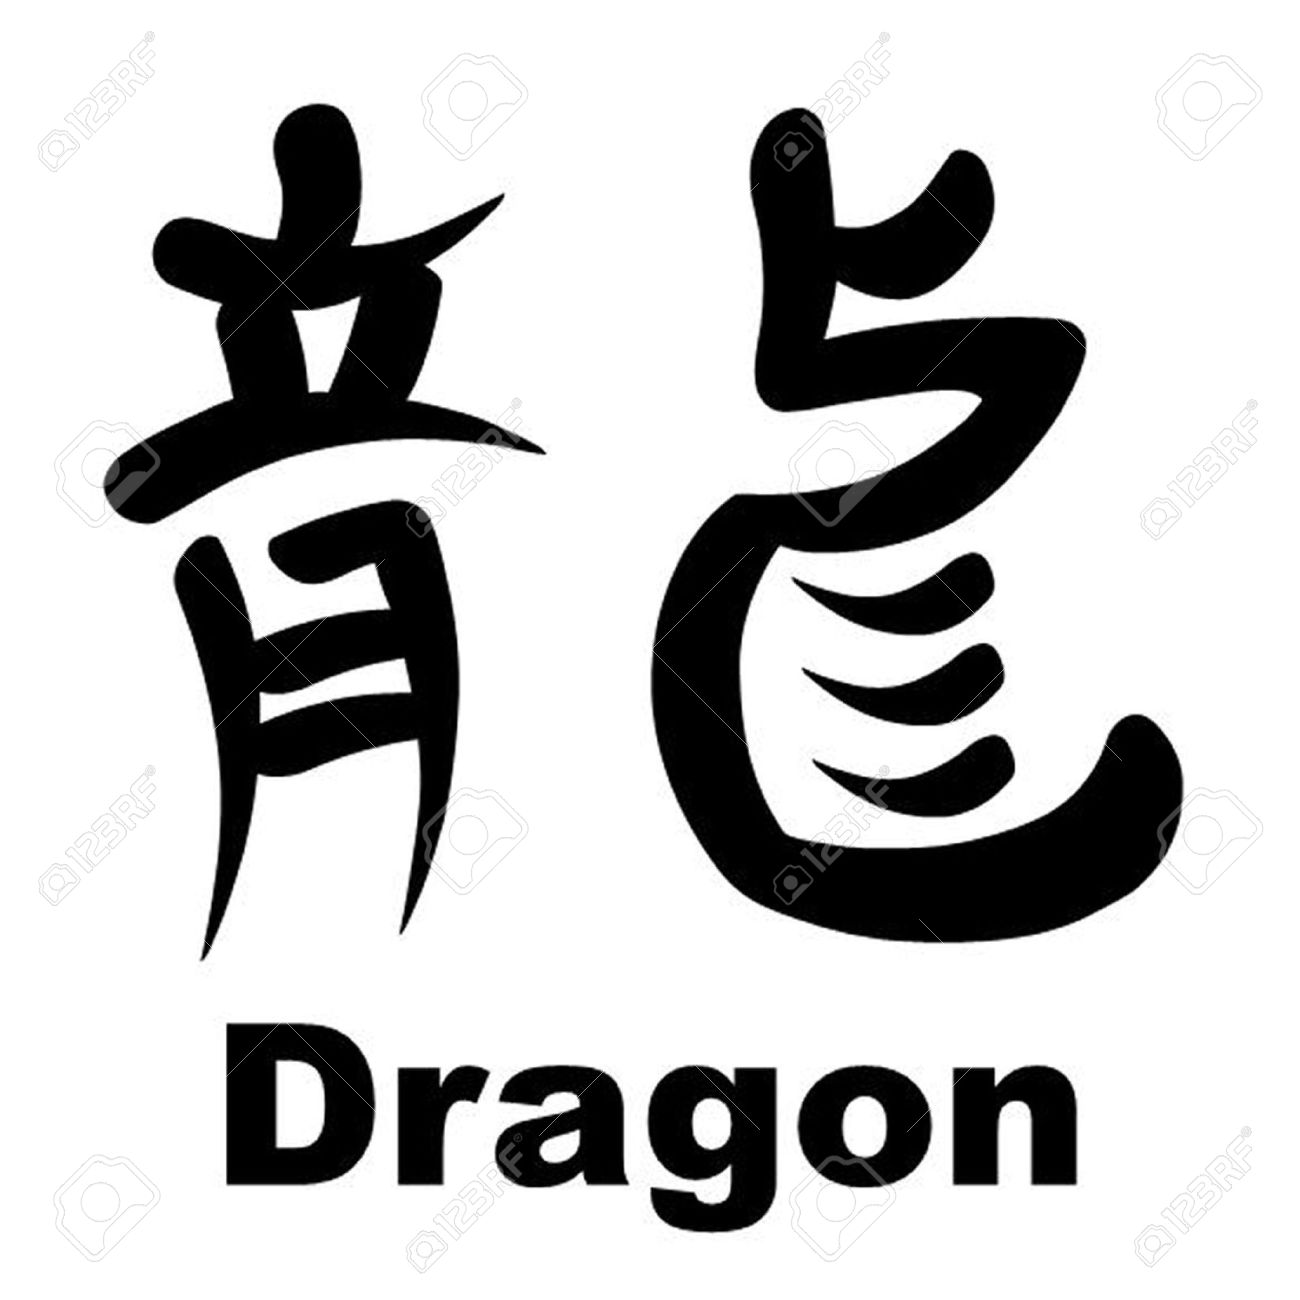 Japanese symbol dragon images symbol and sign ideas dragon japanese symbol view symbol buycottarizona buycottarizona